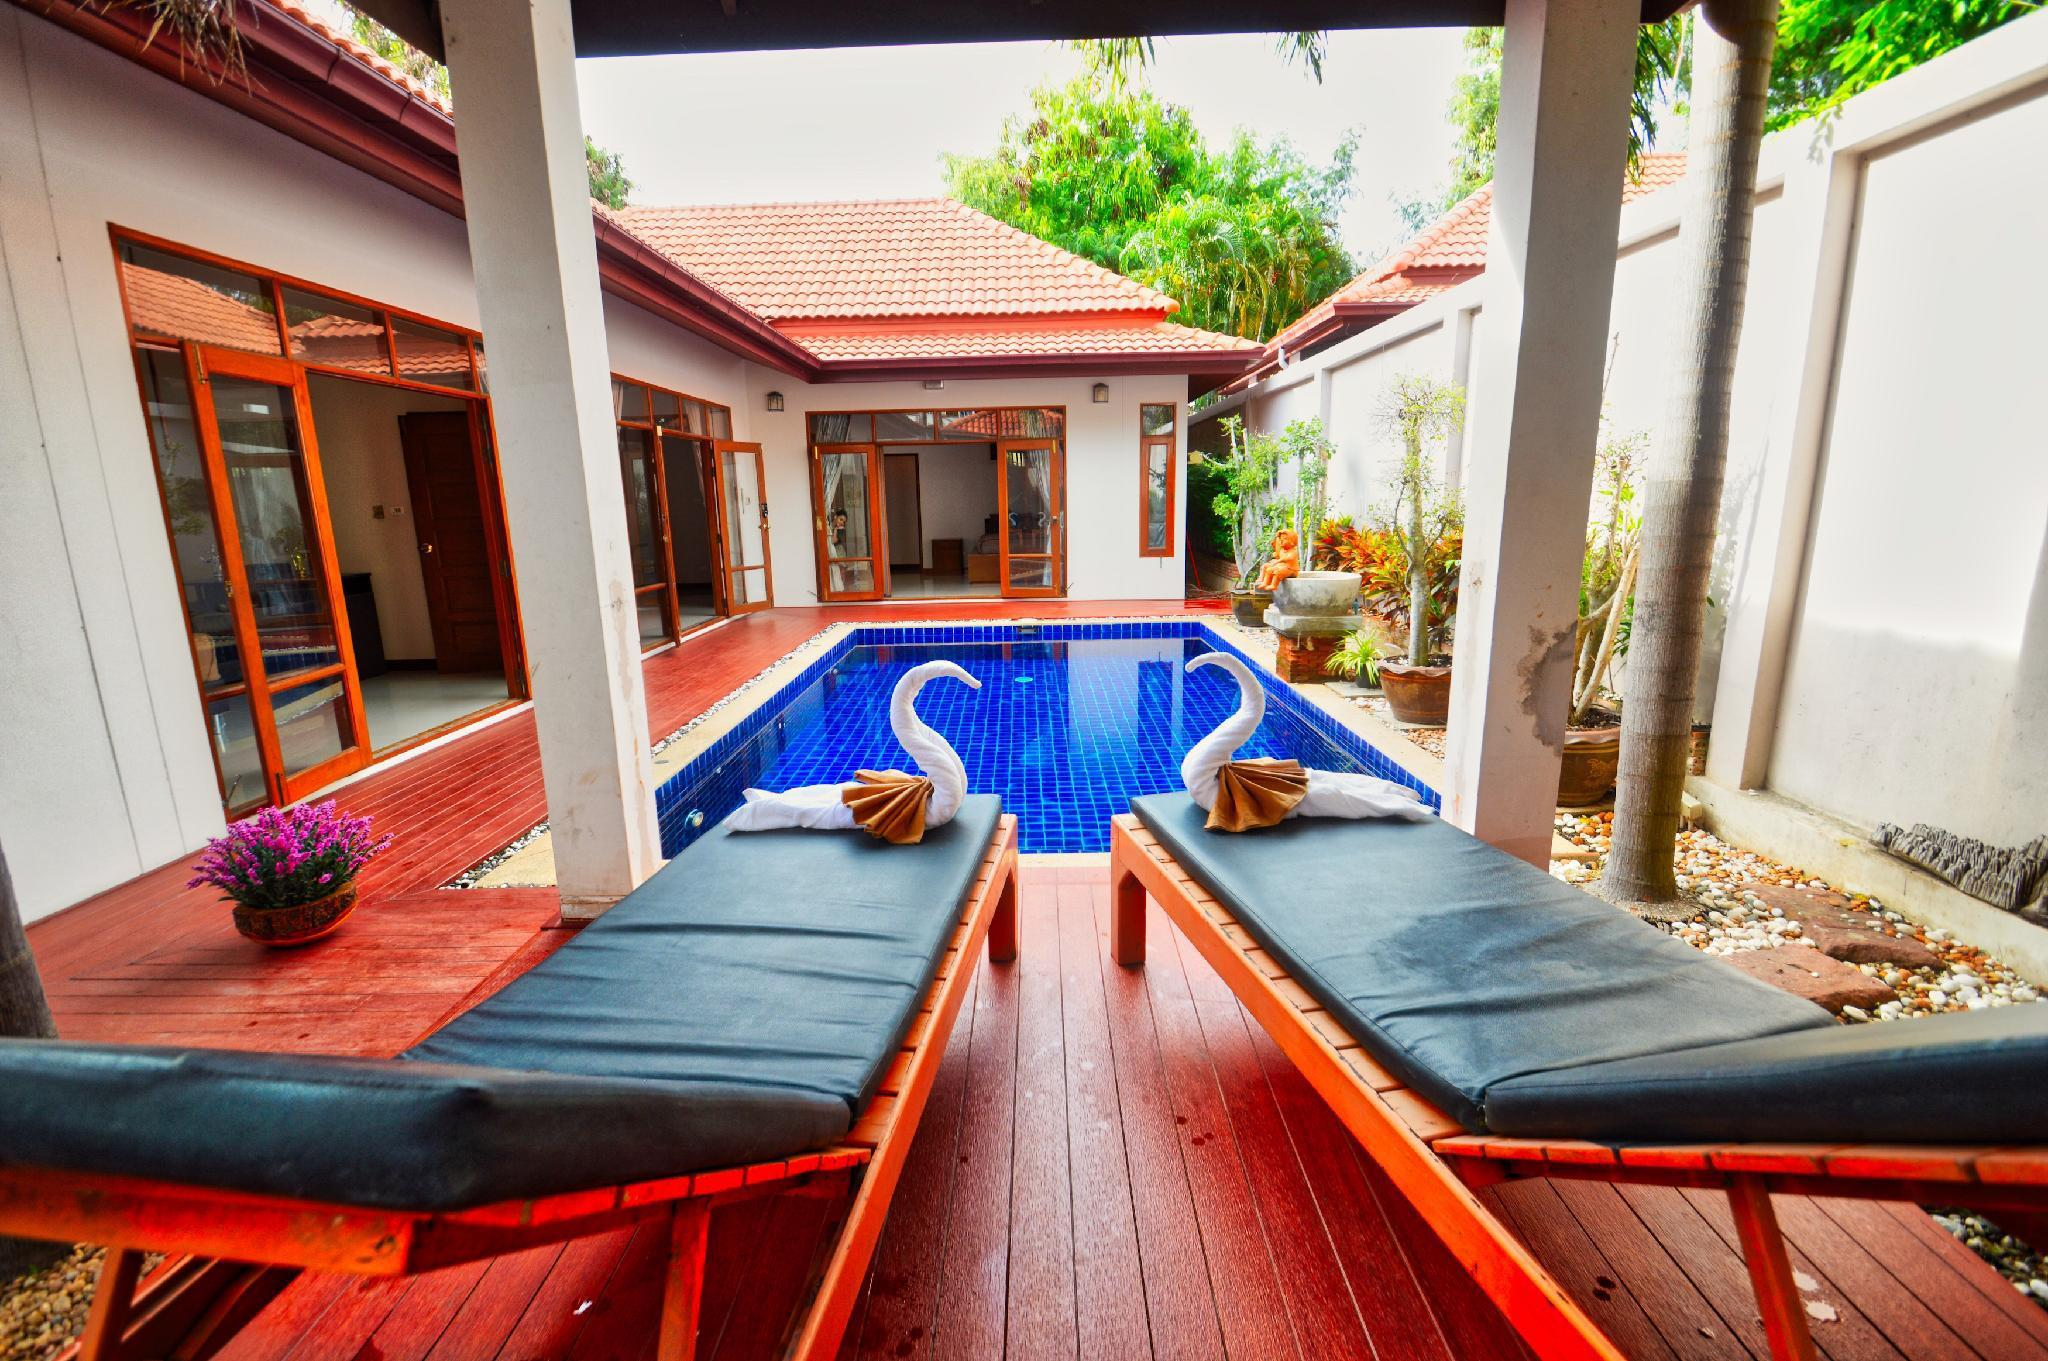 Luxury 6 beds Villa private pool near best beach. Luxury 6 beds Villa private pool near best beach.